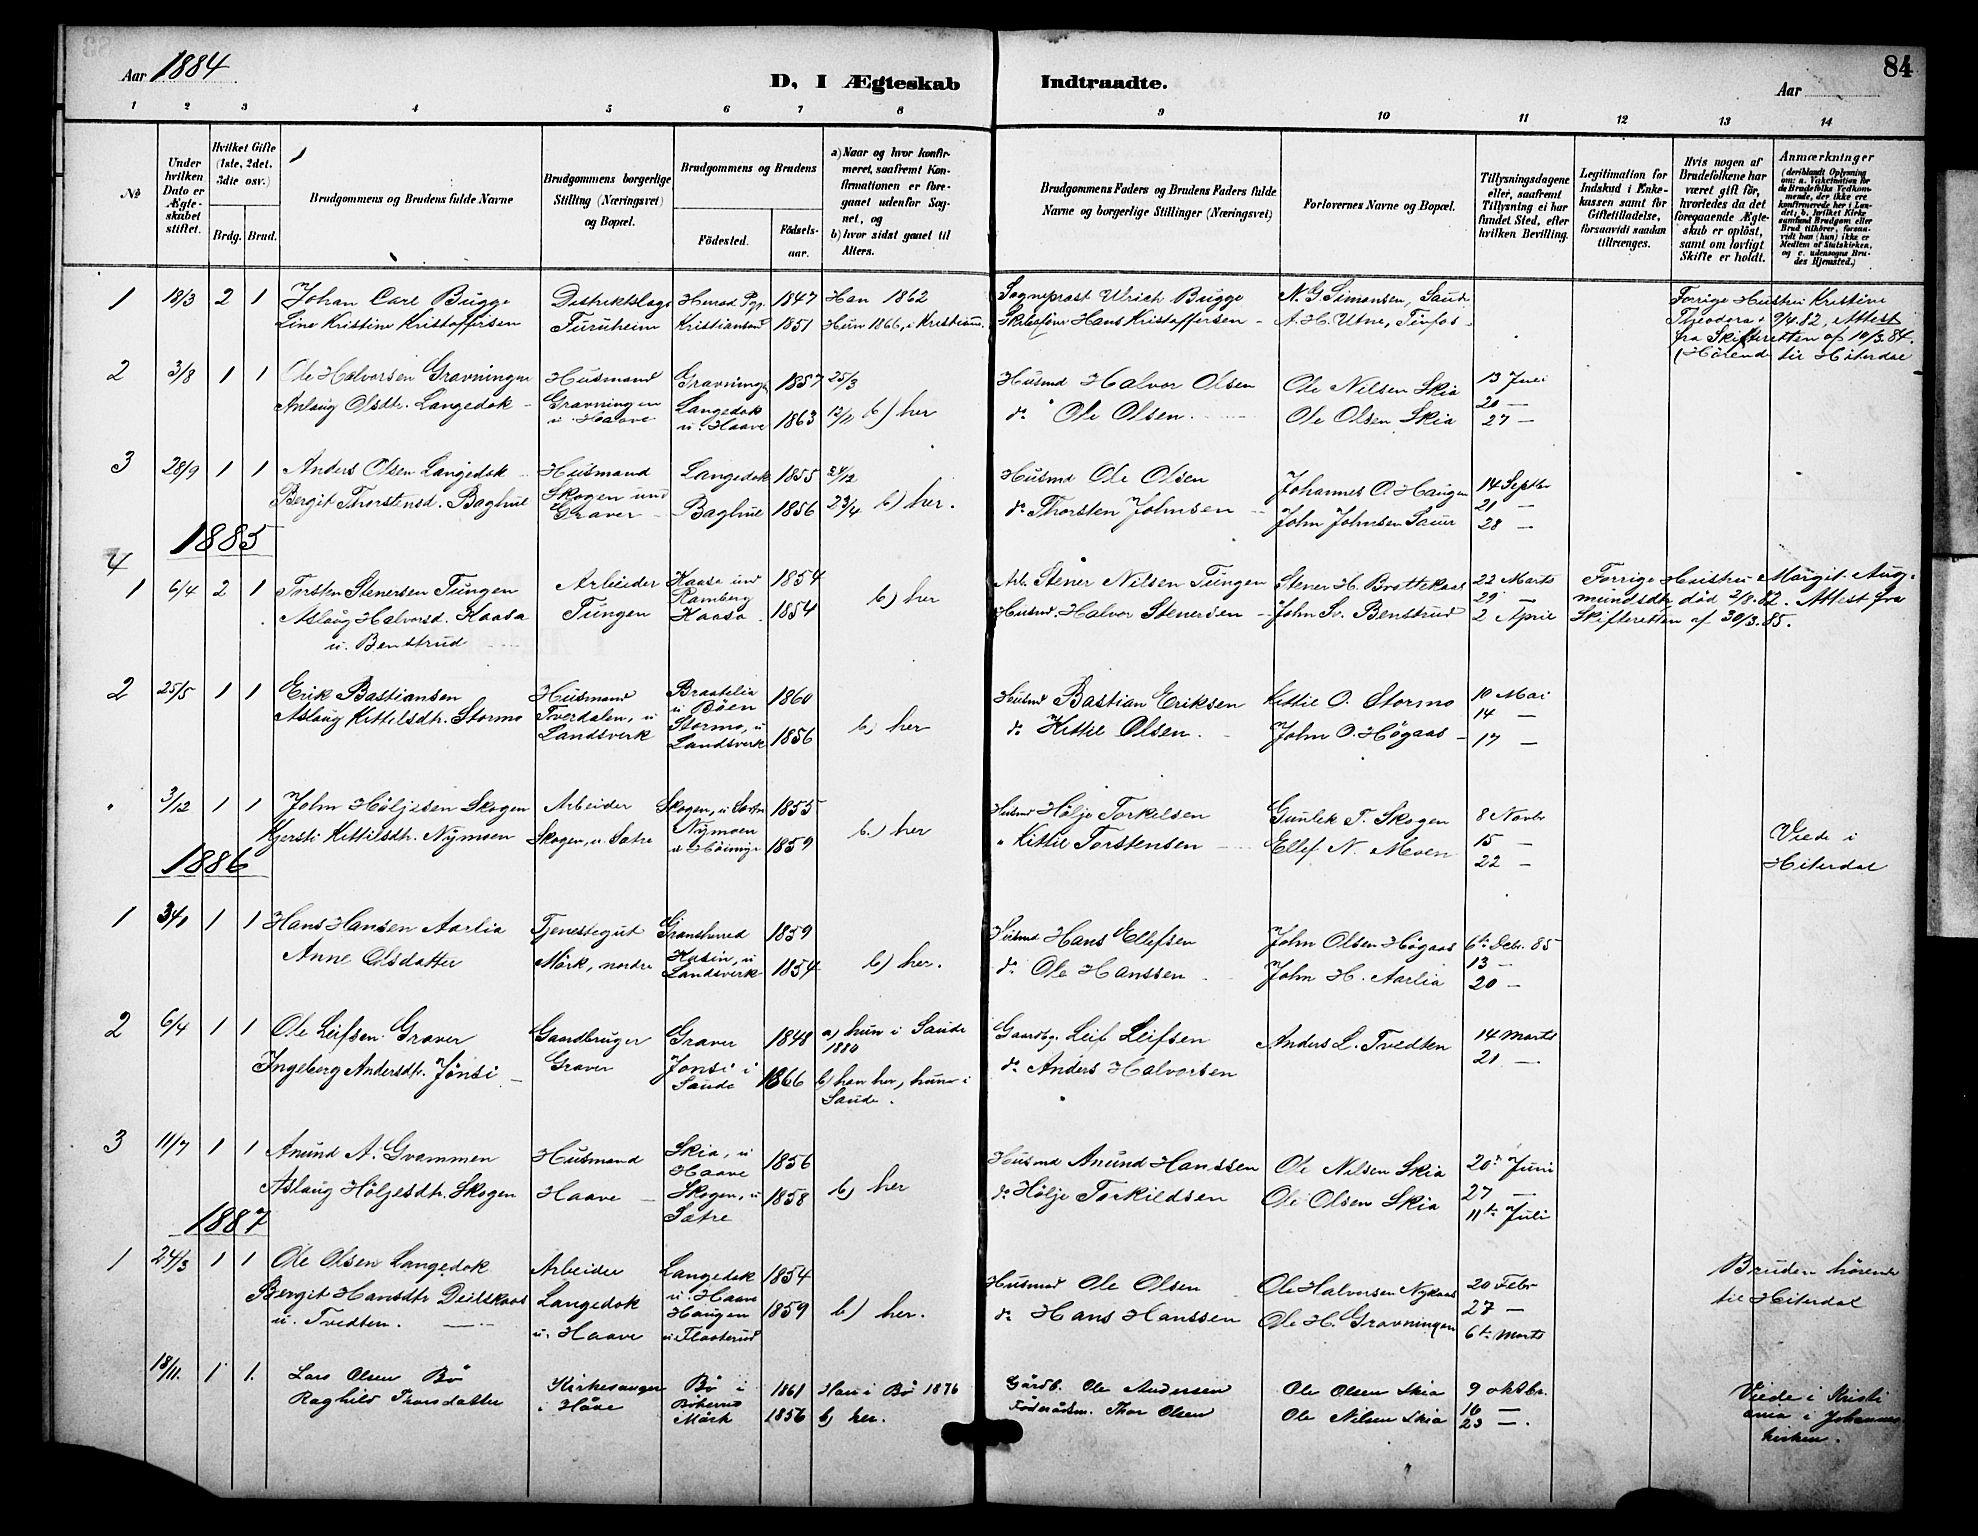 SAKO, Heddal kirkebøker, F/Fb/L0001: Ministerialbok nr. II 1, 1884-1910, s. 84